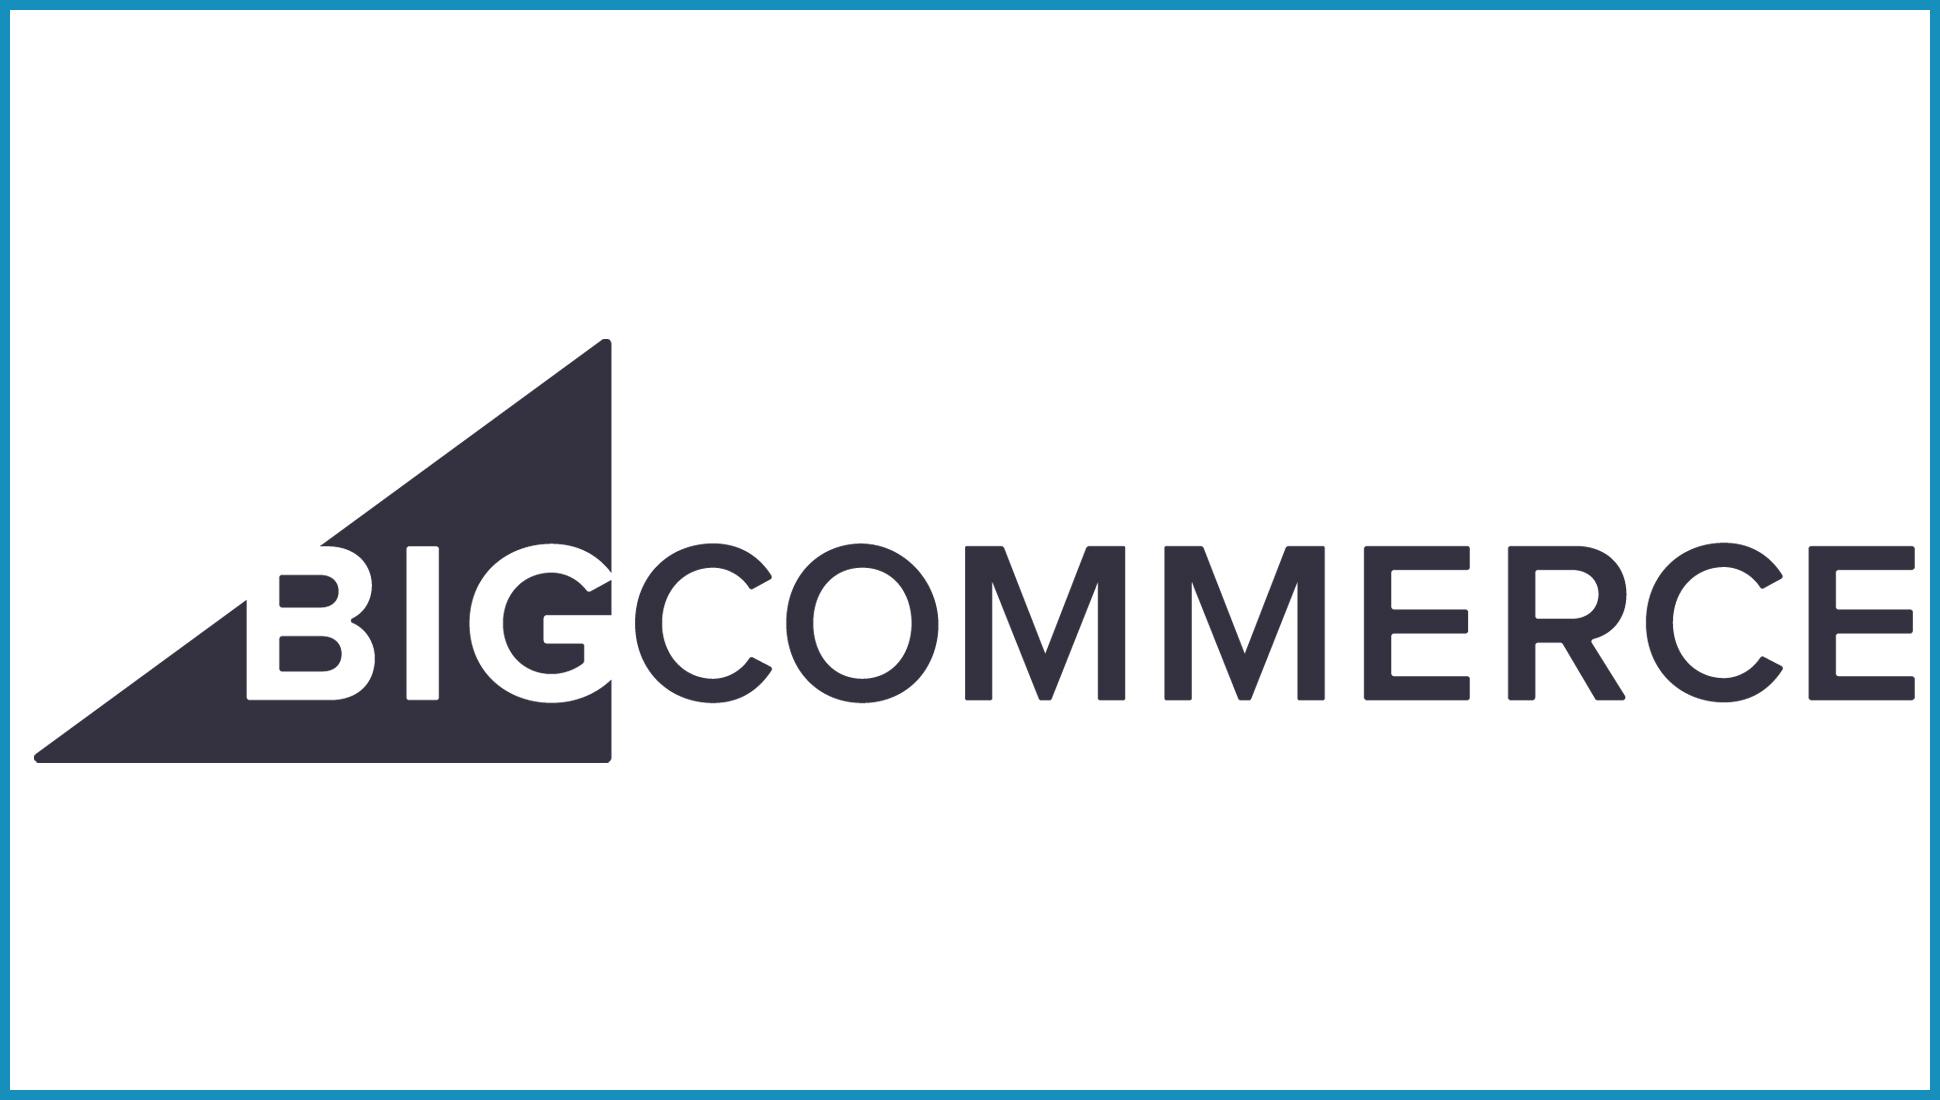 BigCommerce's logo